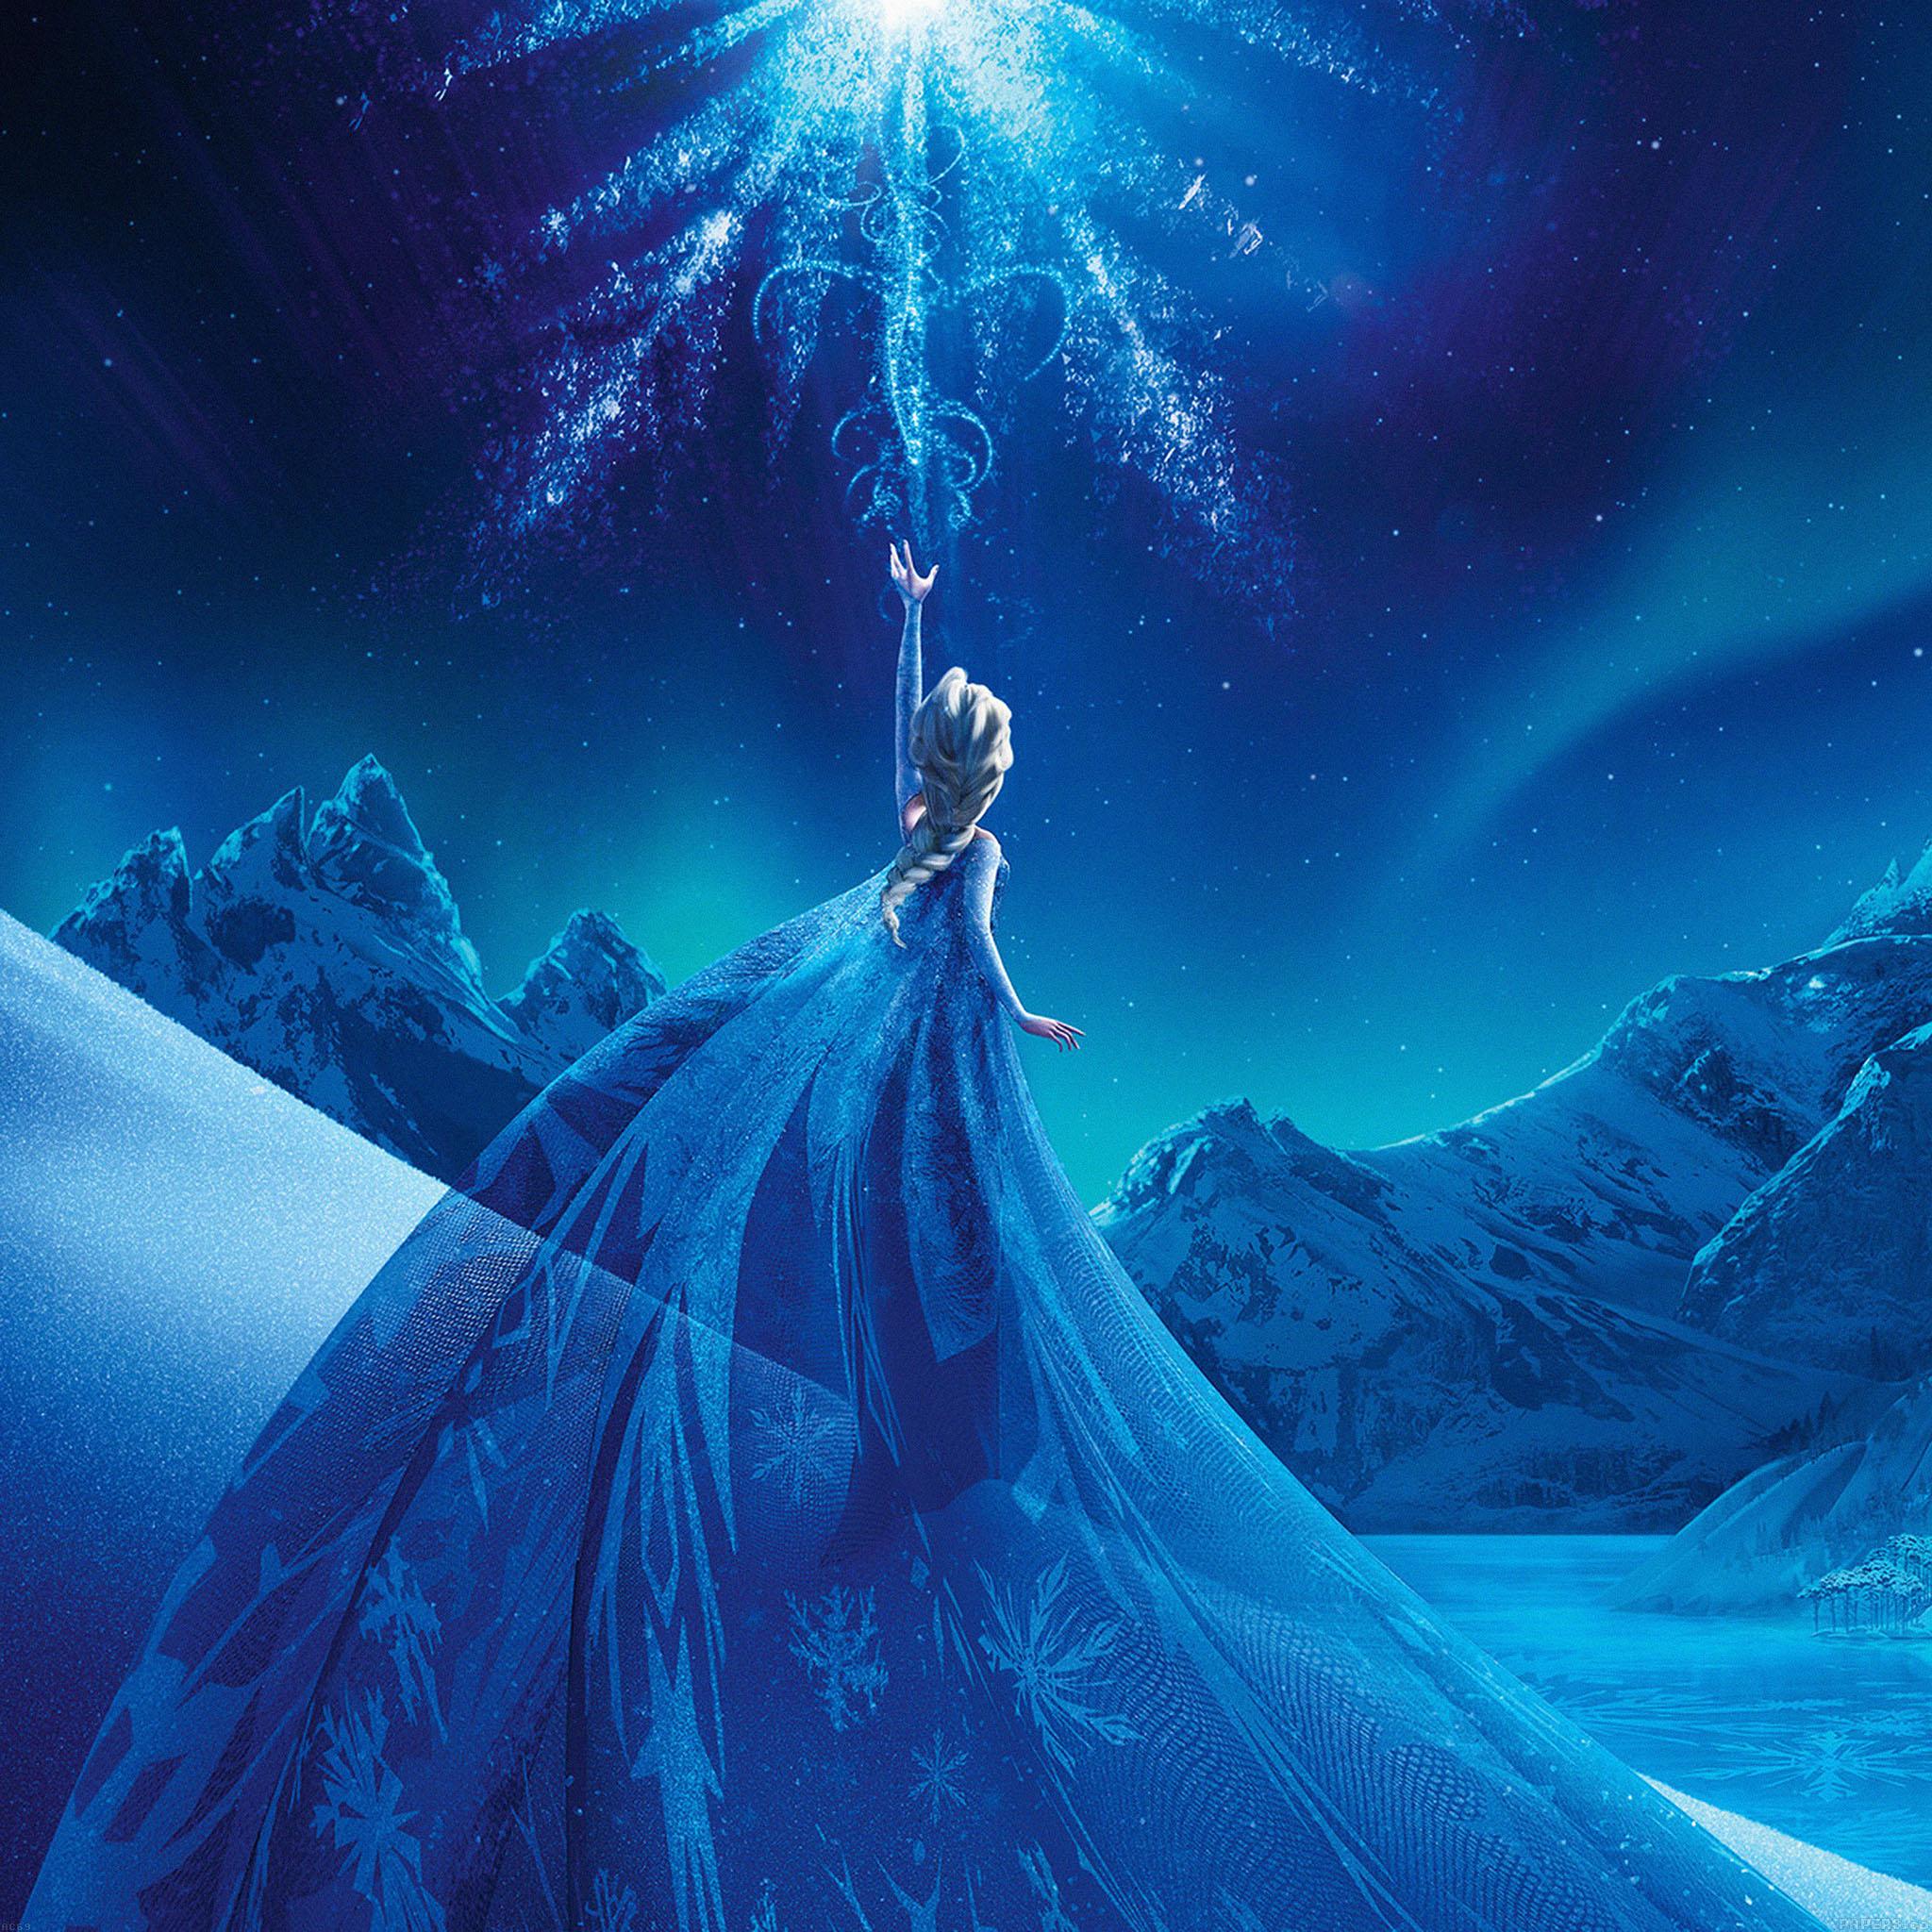 FREEIOS7 ac69-wallpaper-elsa-frozen-queen-disney-illust